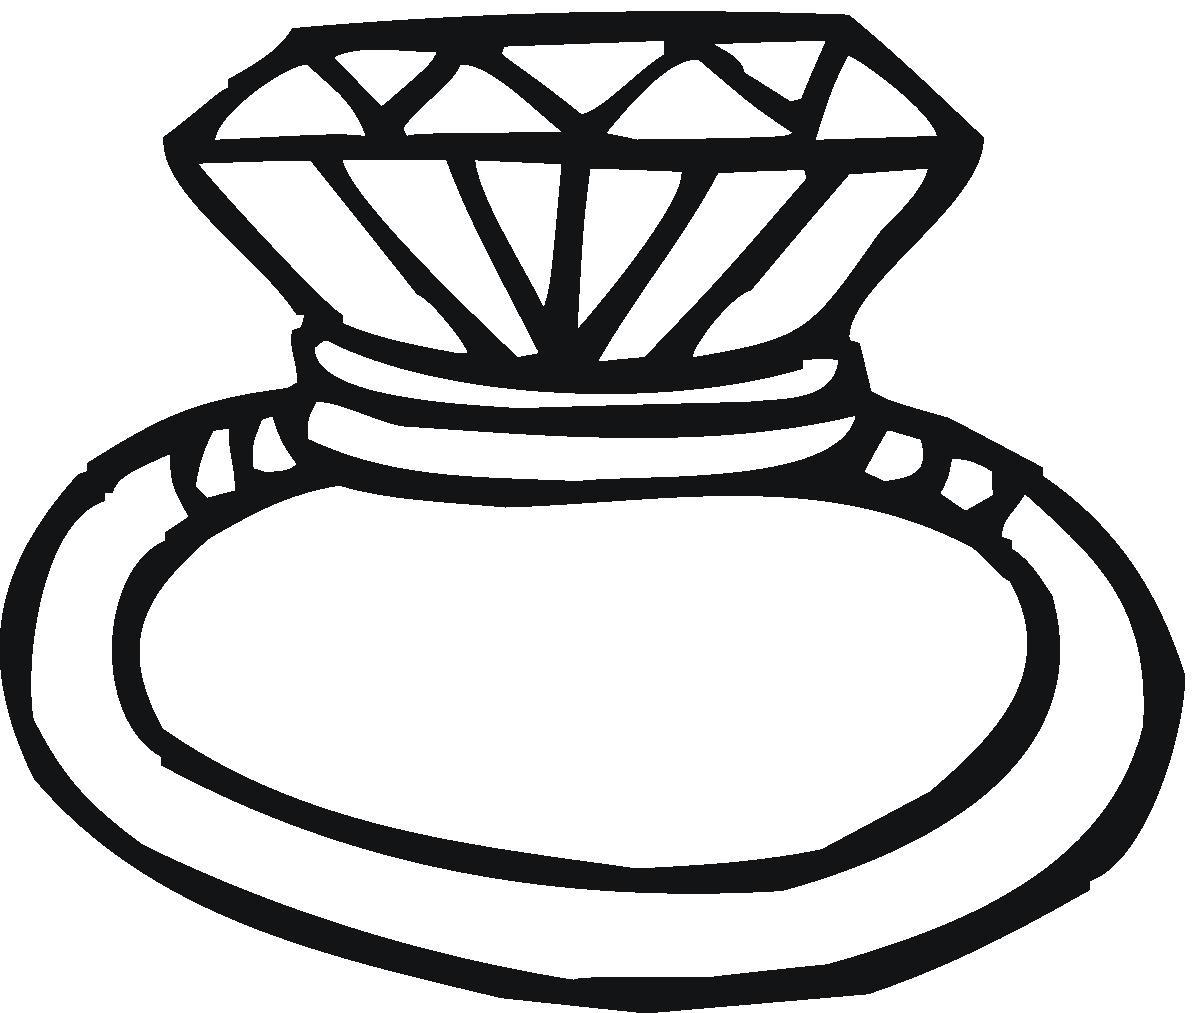 Decoration clipart wedding ring Ring wedding white ring Art